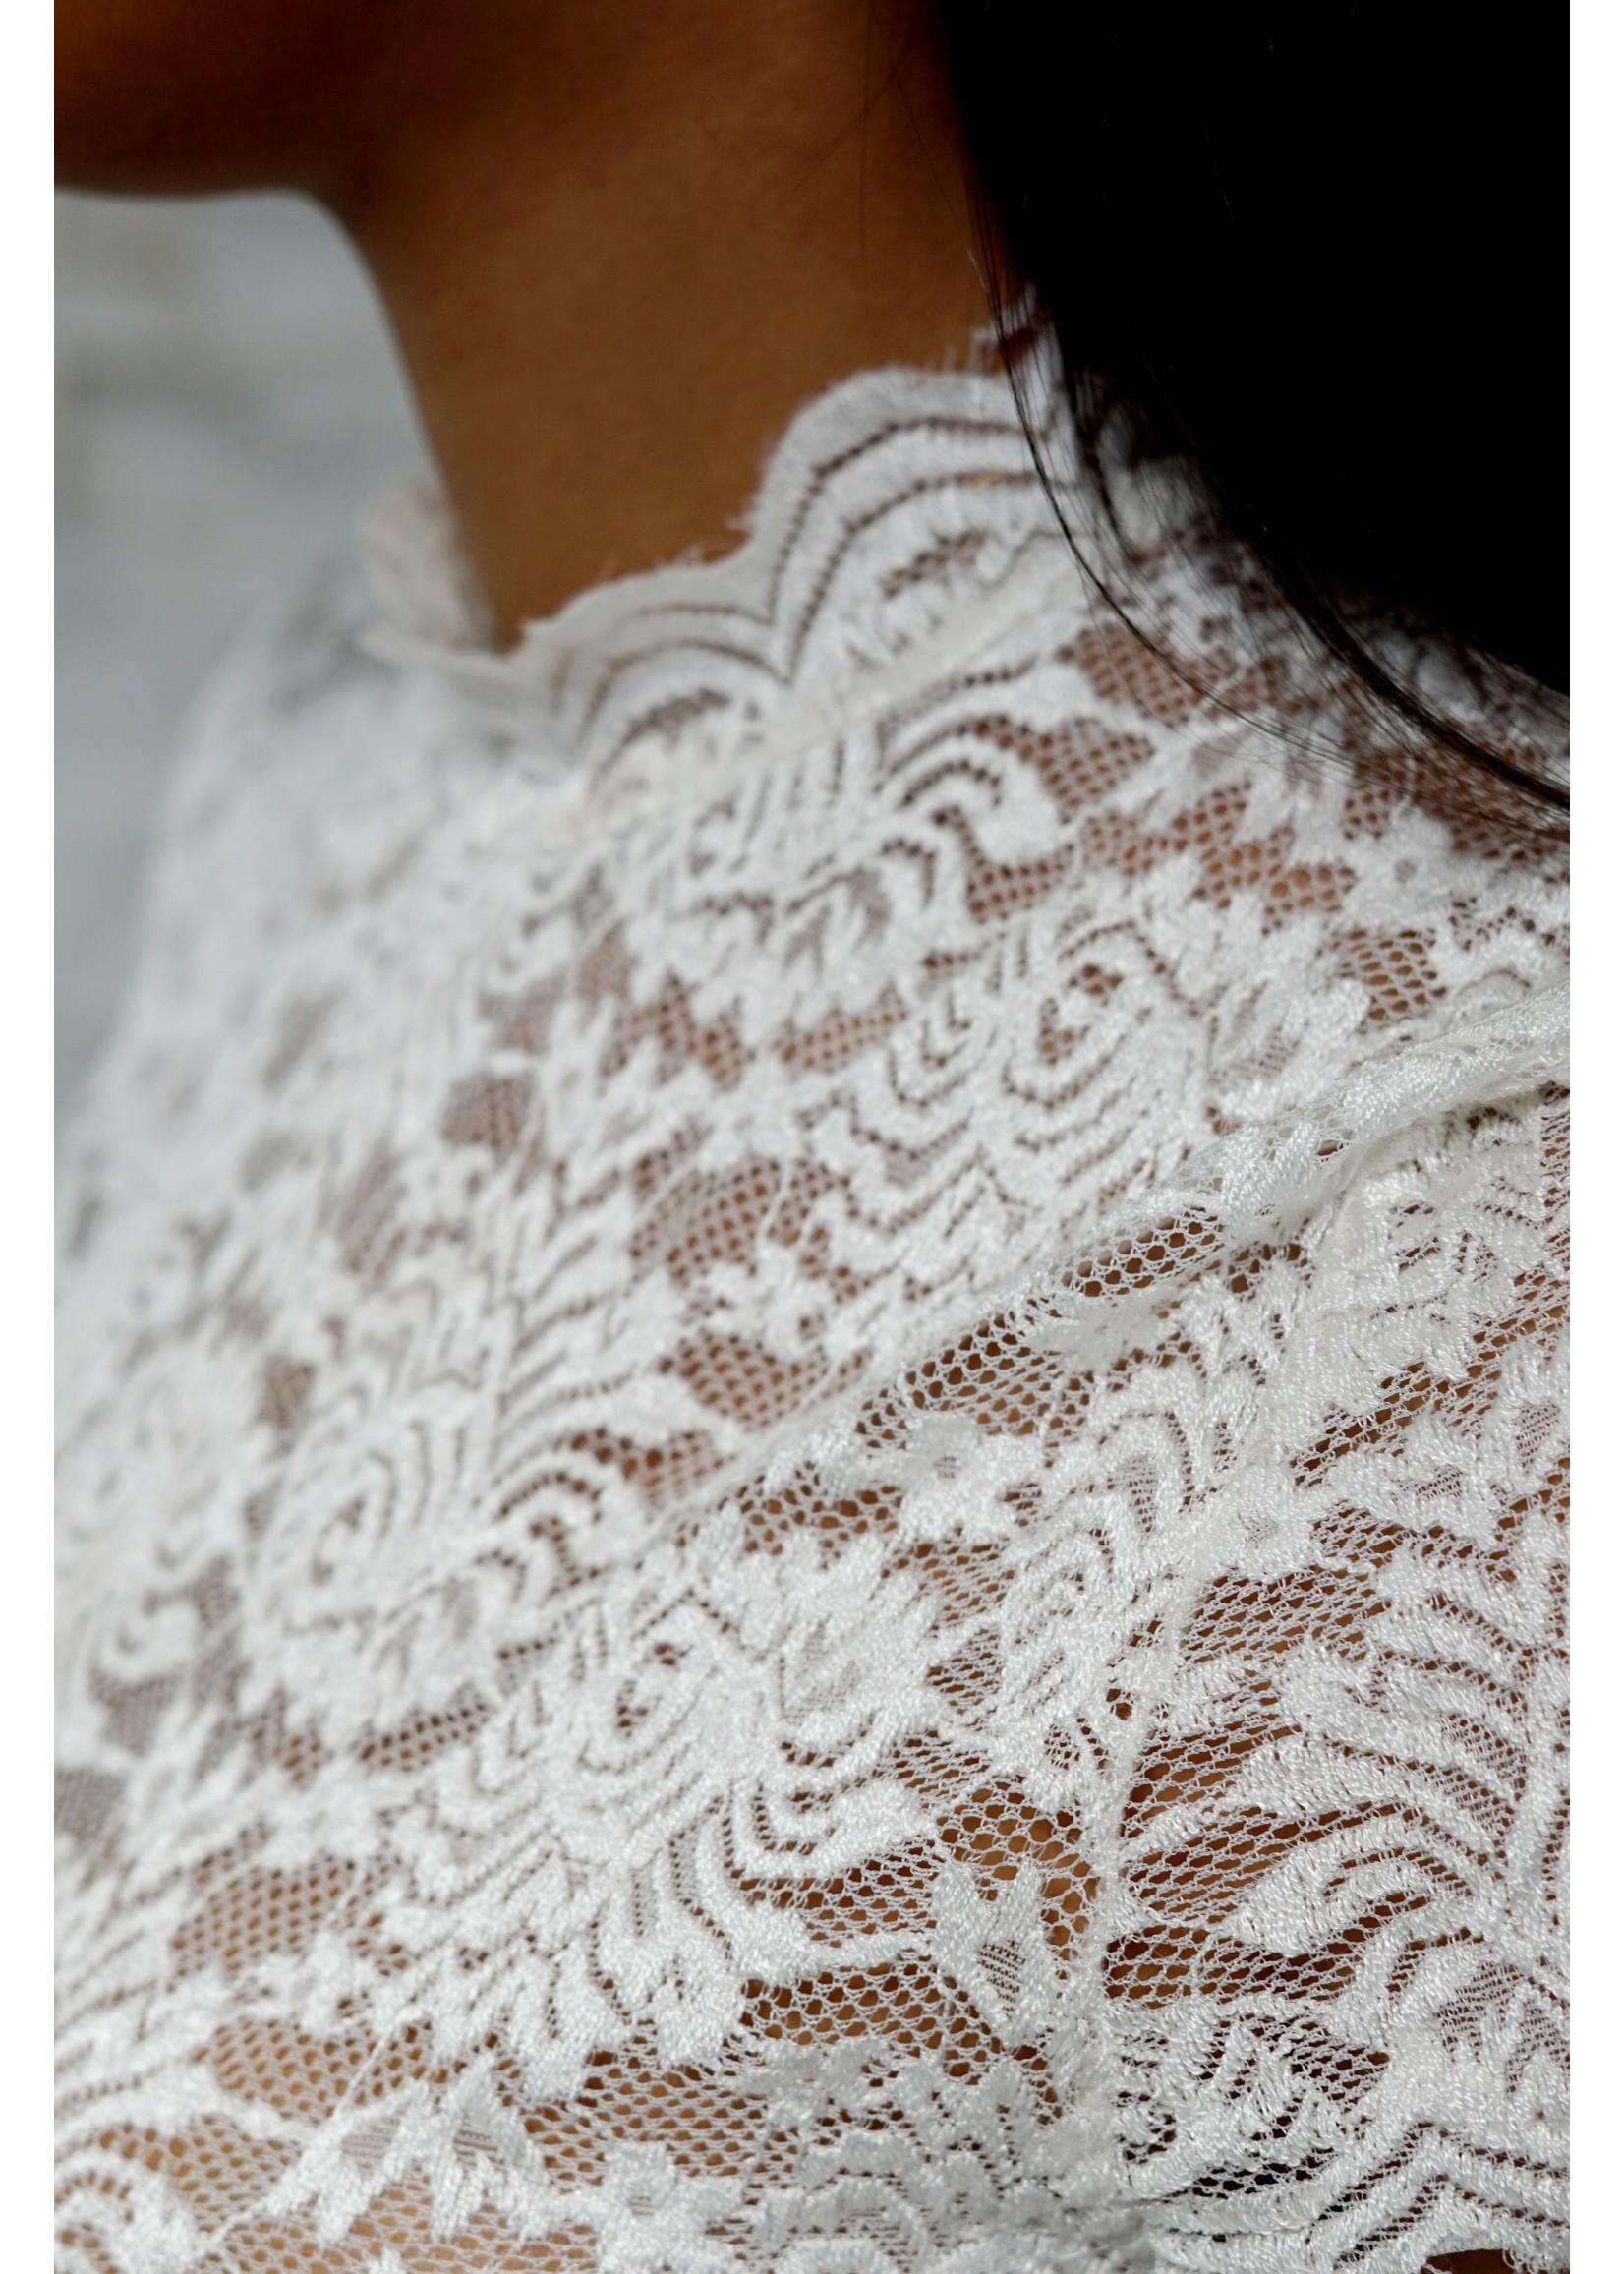 Lofty Manner See through top white